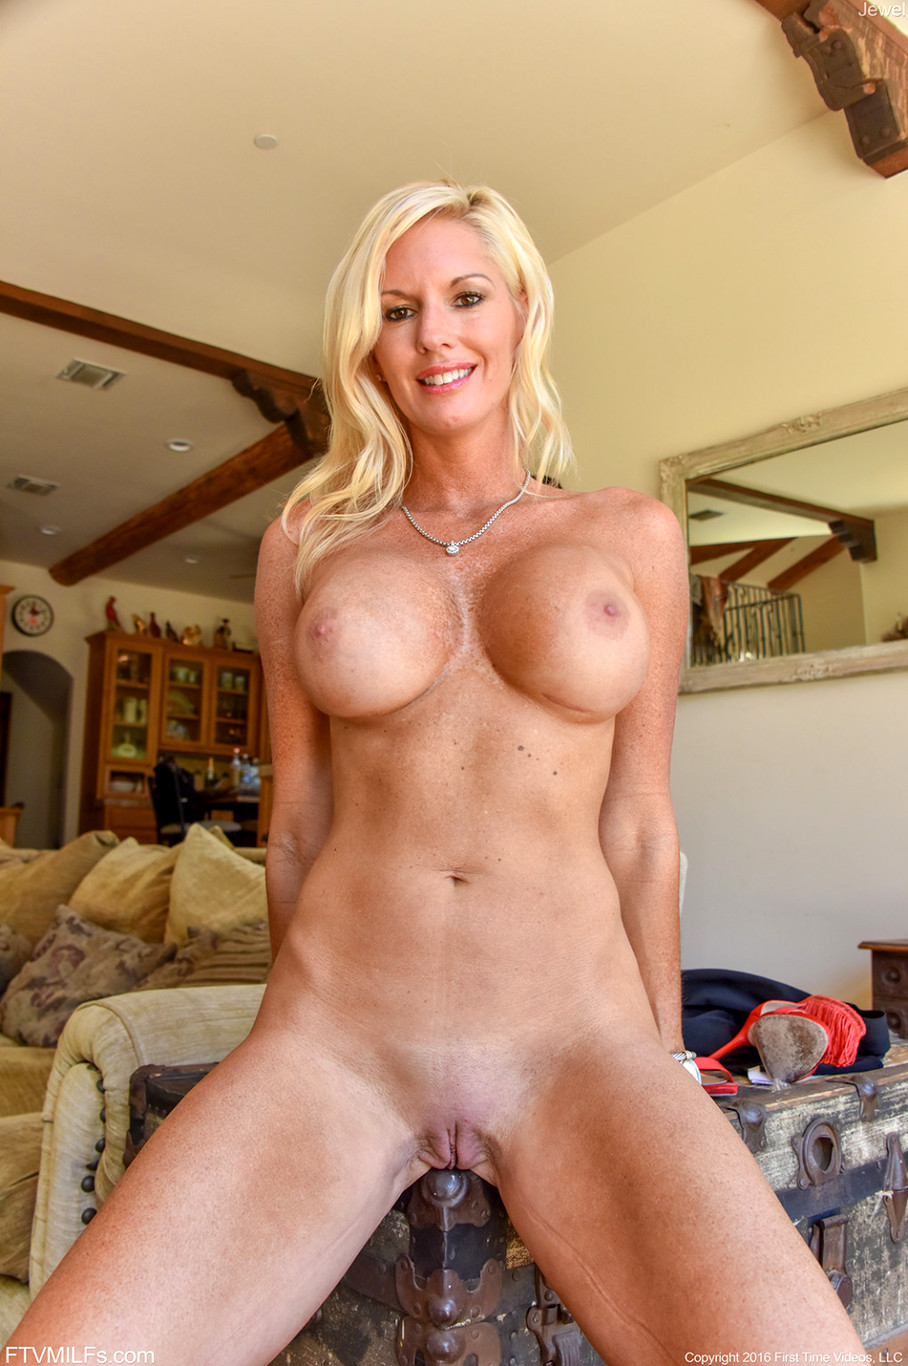 Ftv Milfs Jewel Thursday Big Tits Premium Pics Sex HD Pics